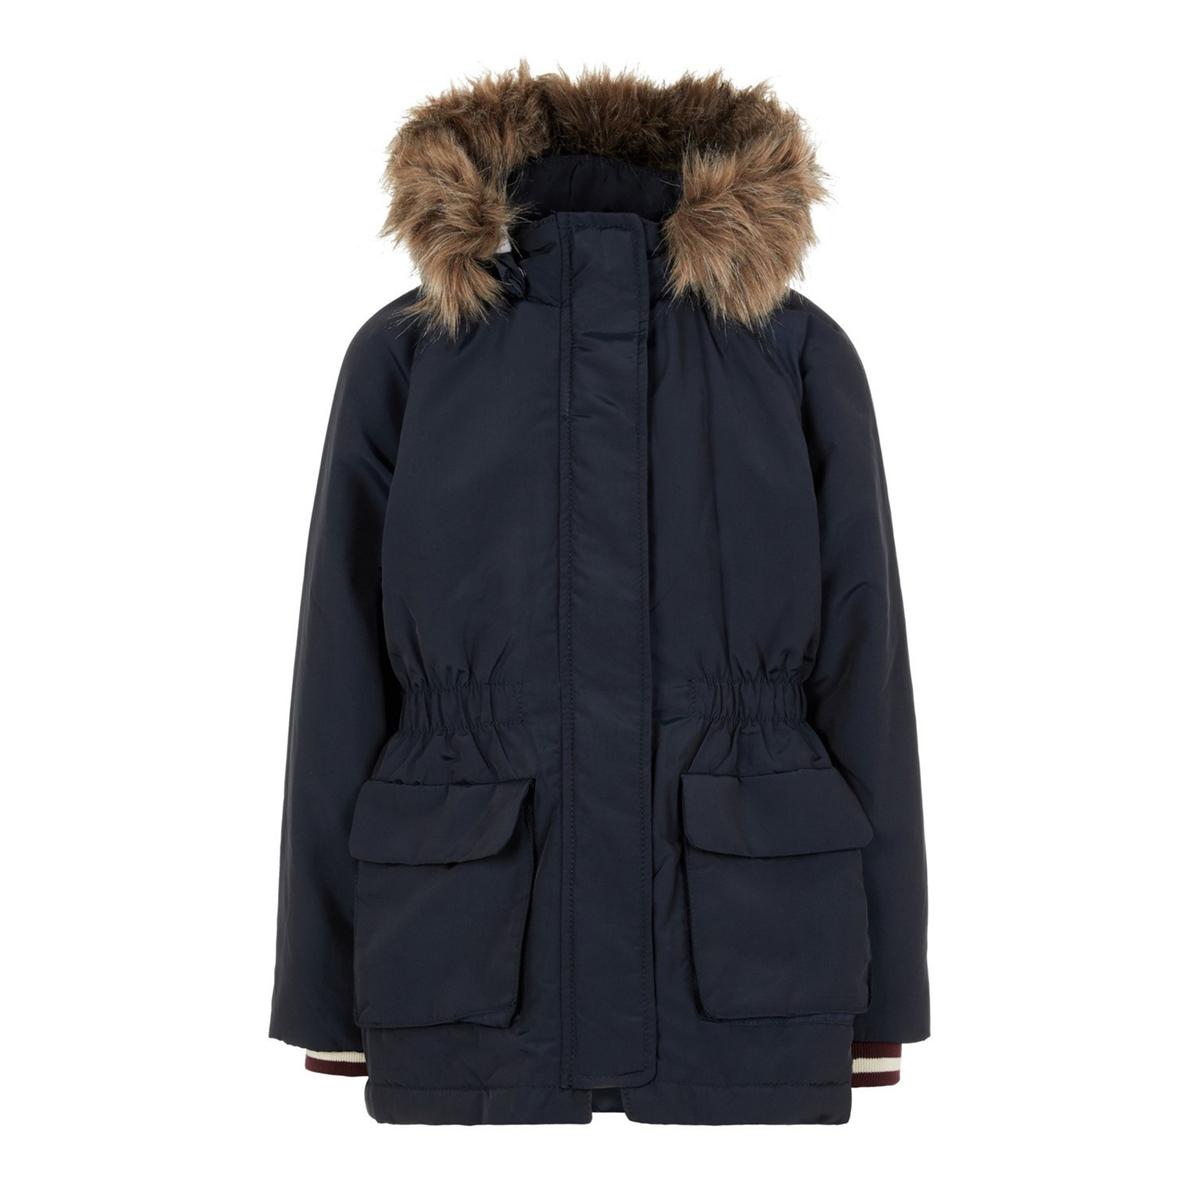 цена Парка La Redoute Зимняя с капюшоном 7 лет - 120 см синий онлайн в 2017 году